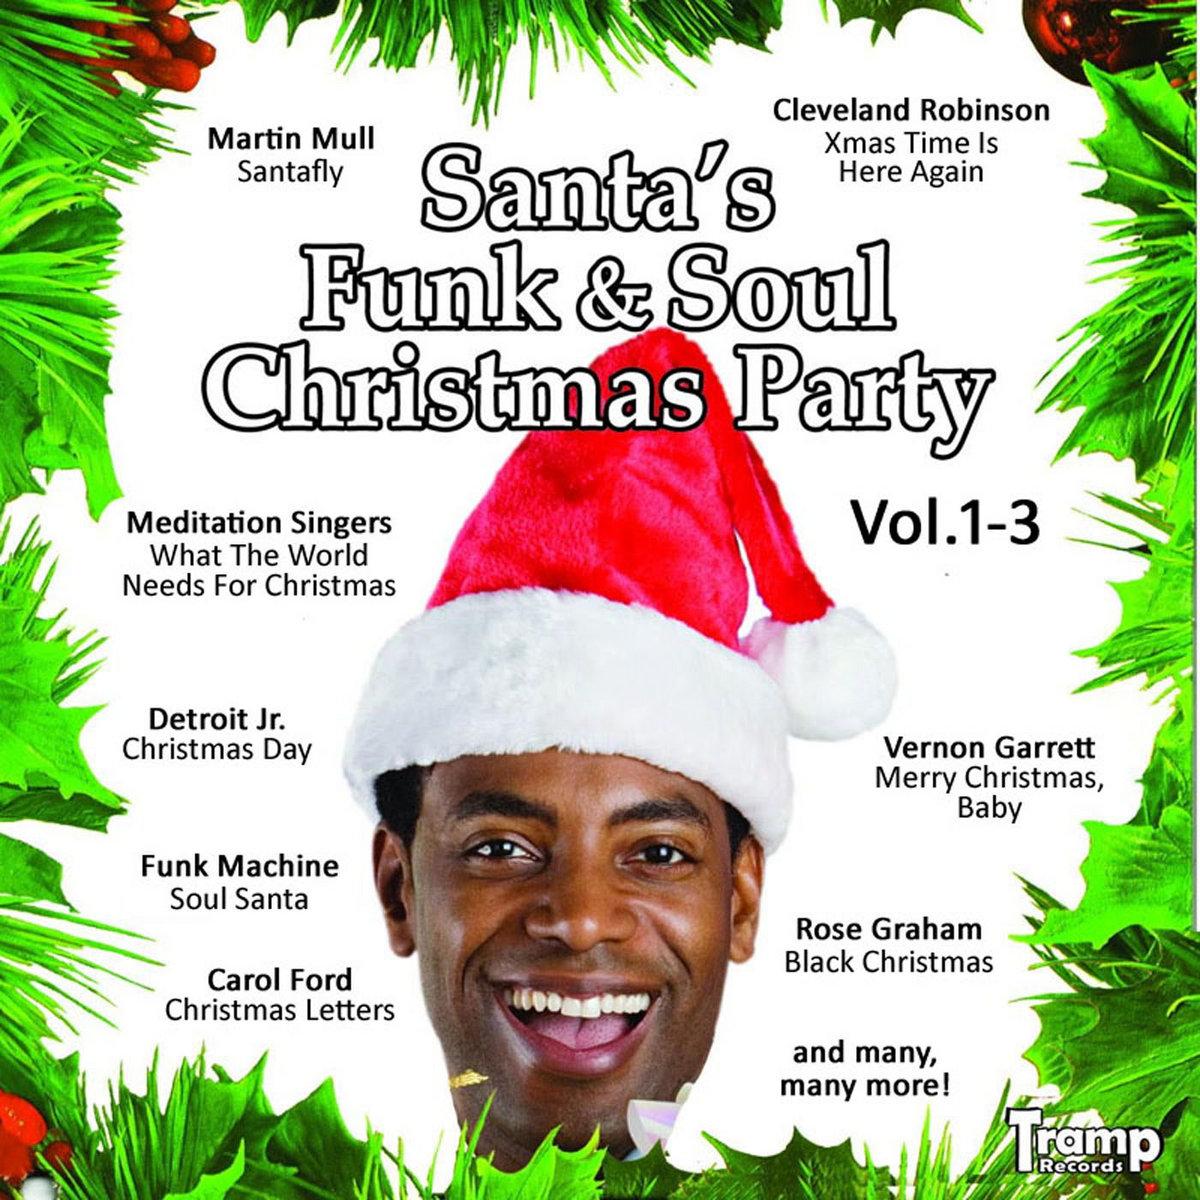 Santa's Funk & Soul Christmas Party Vol 1-3 | Tramp Rec